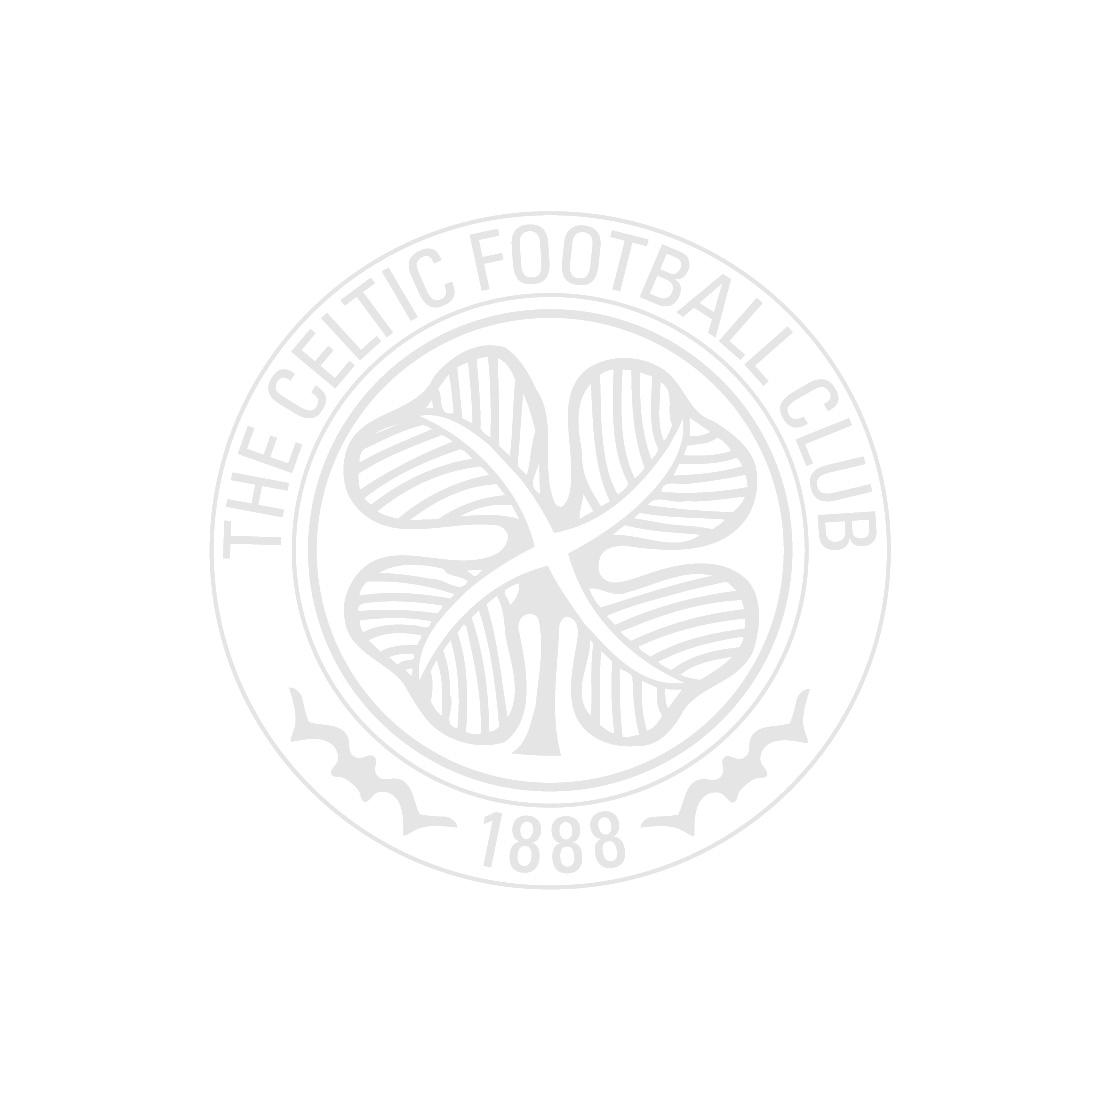 5e69de3a4 Celtic Junior Home Goalkeeper Top 18 19 with Long Sleeves